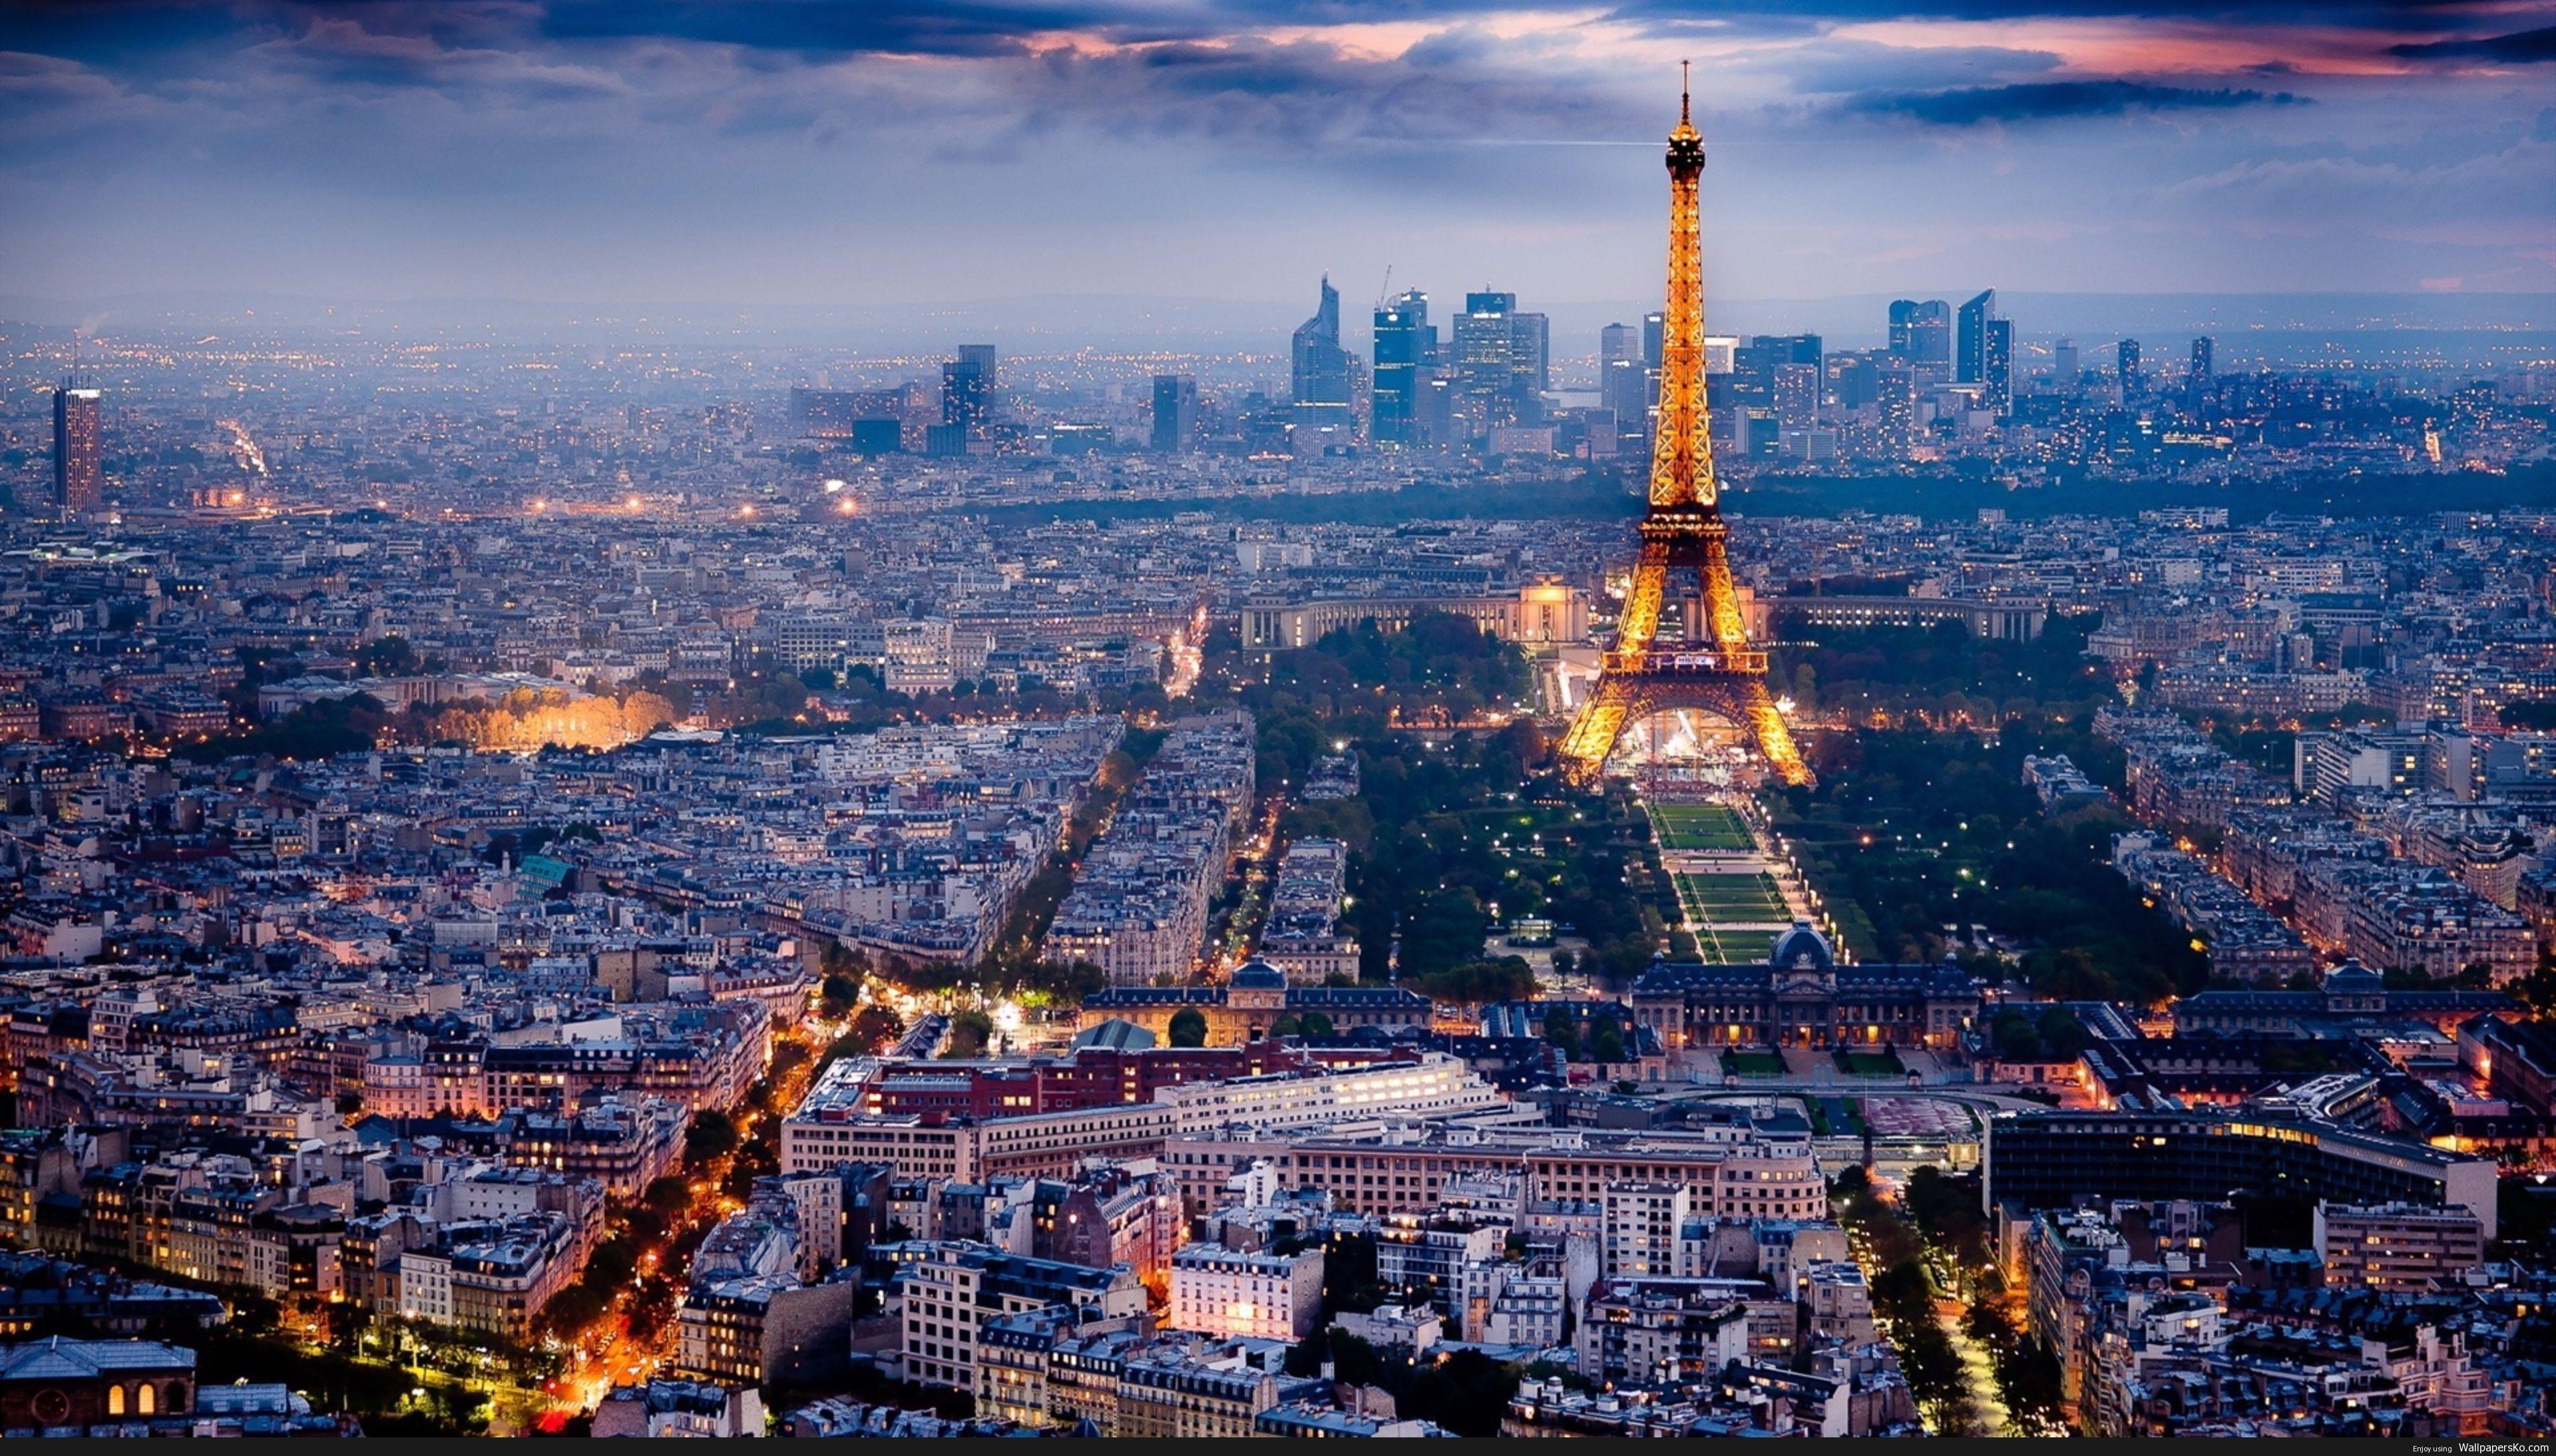 4k Paris Wallpapers Top Free 4k Paris Backgrounds Wallpaperaccess